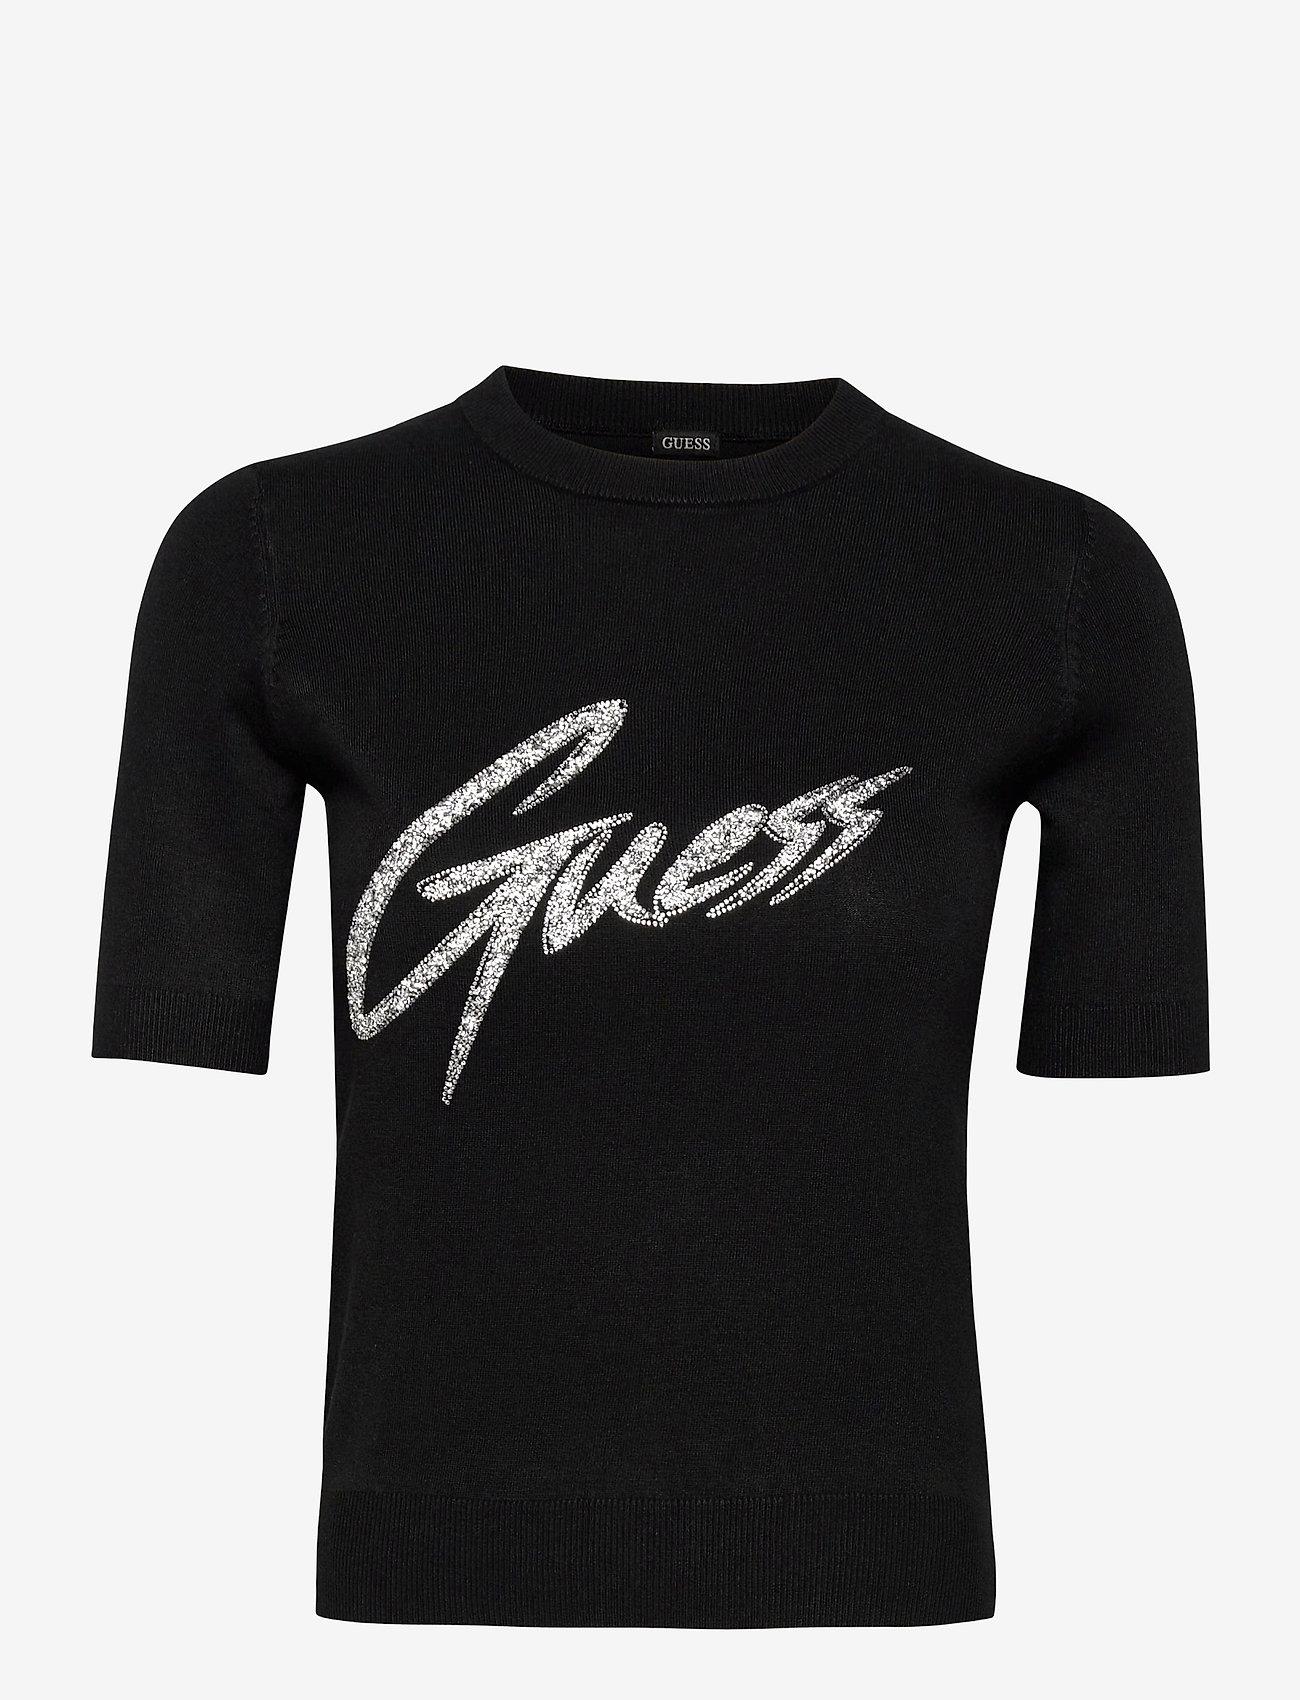 GUESS Jeans - DEBORAH RN SWEATER - gebreide t-shirts - jet black a996 - 0